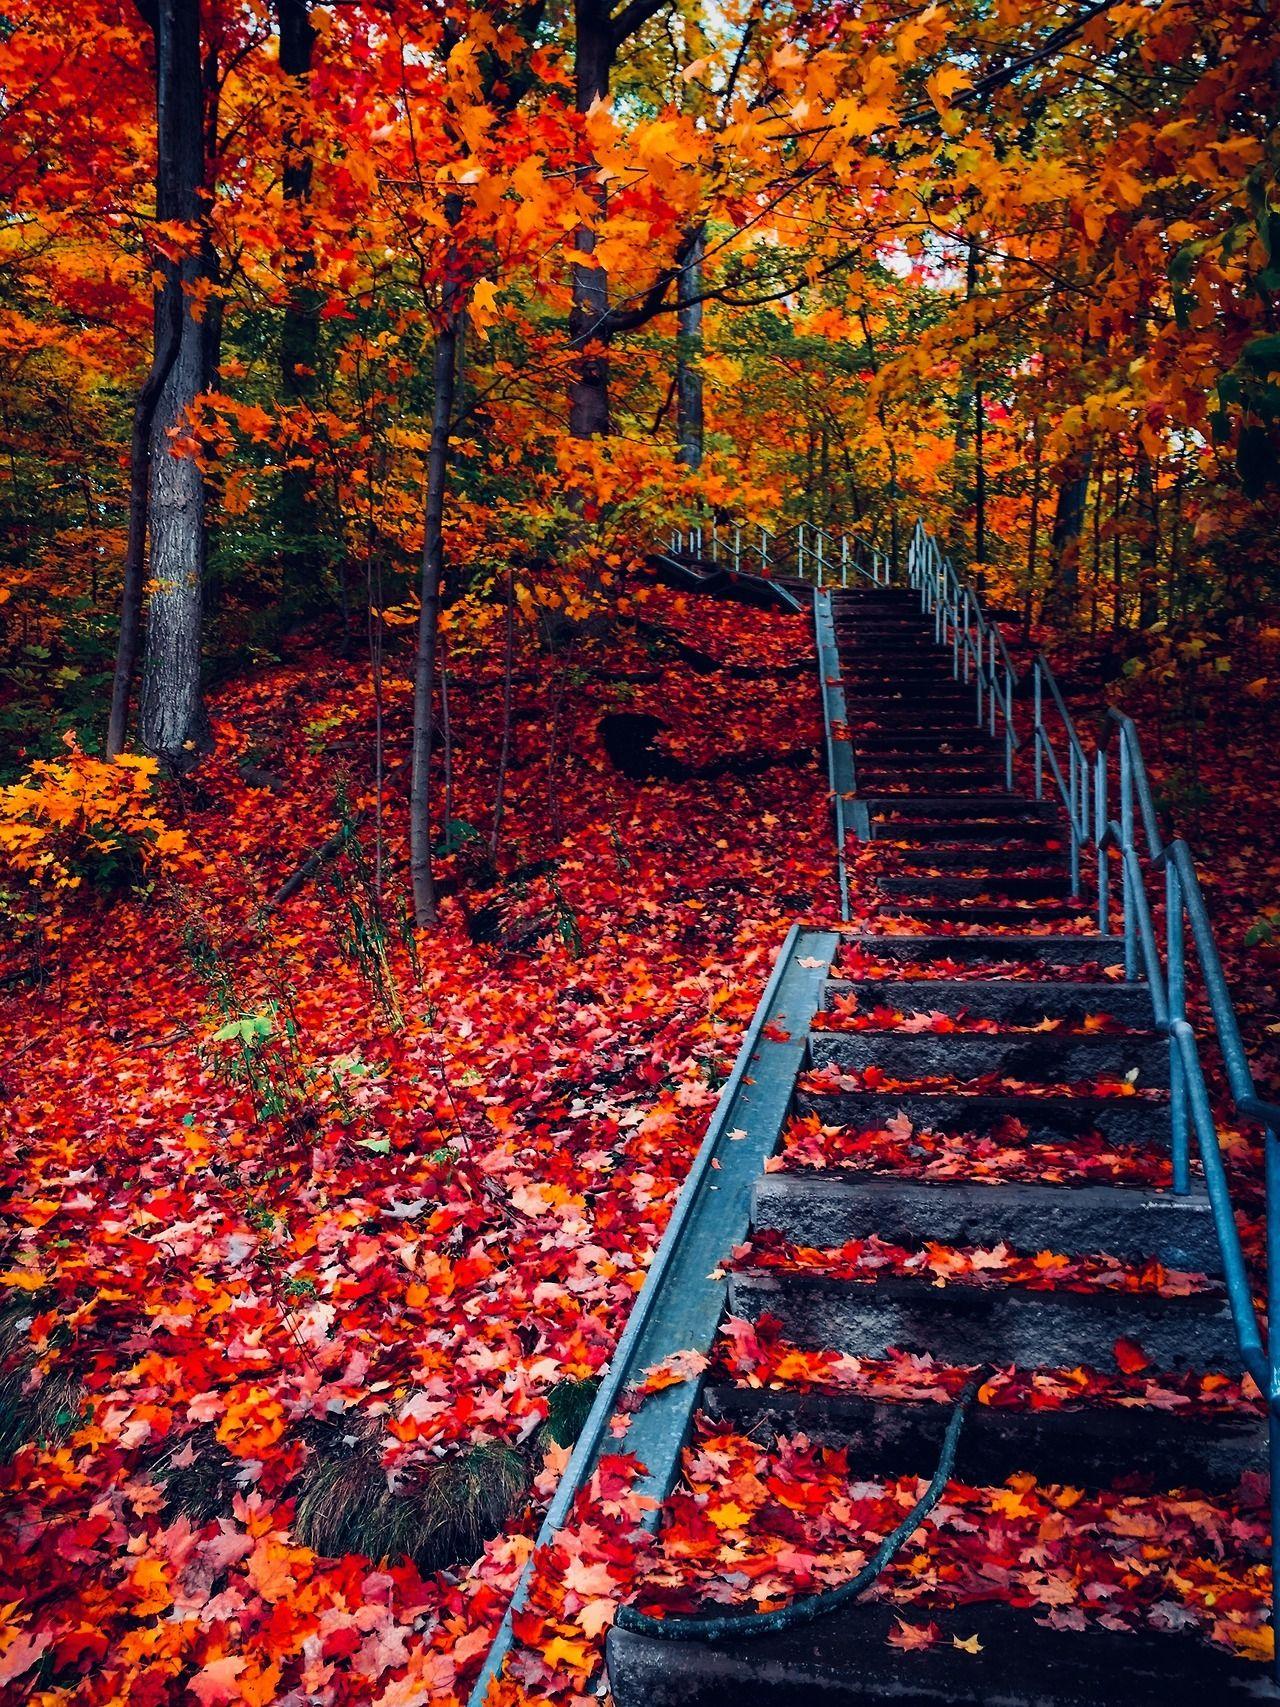 Erase Rewind Autumn Landscape Autumn Scenery Autumn Scenes